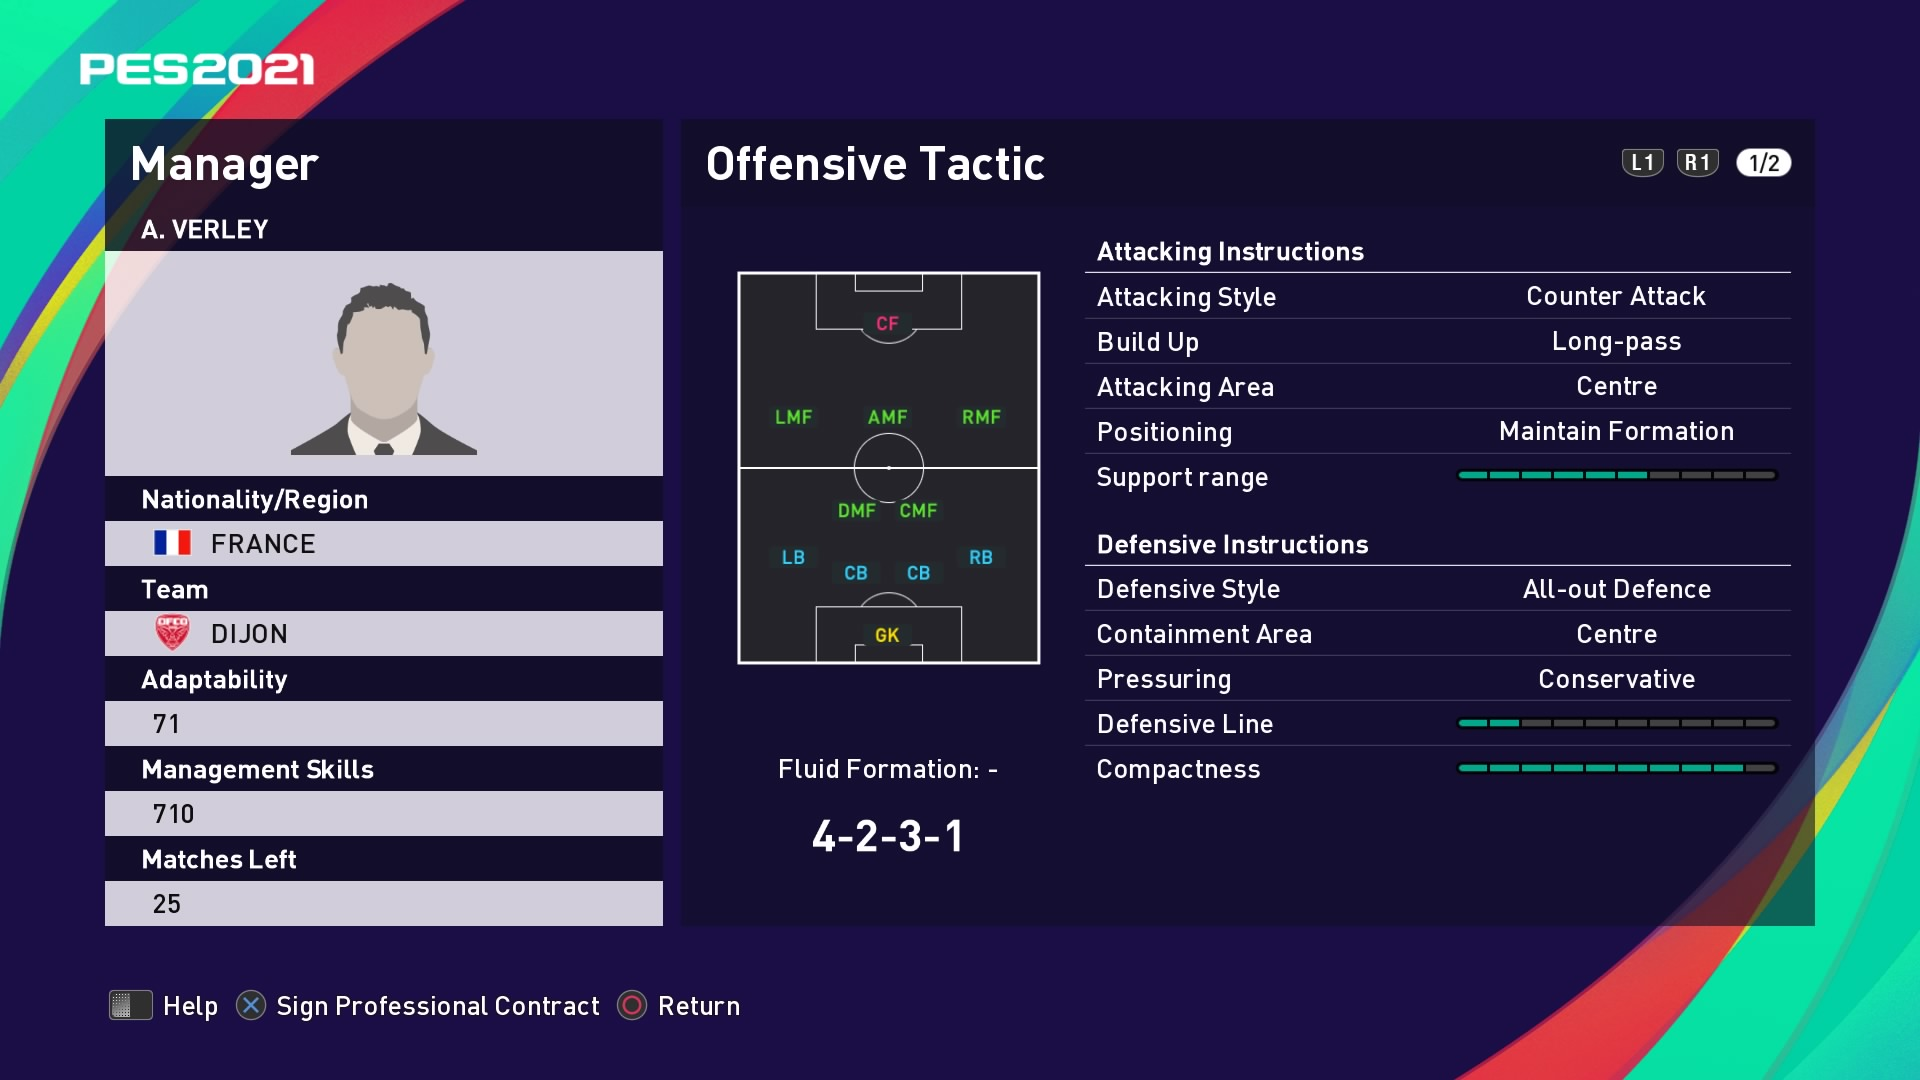 A. Verley (Stéphane Jobard) Offensive Tactic in PES 2021 myClub